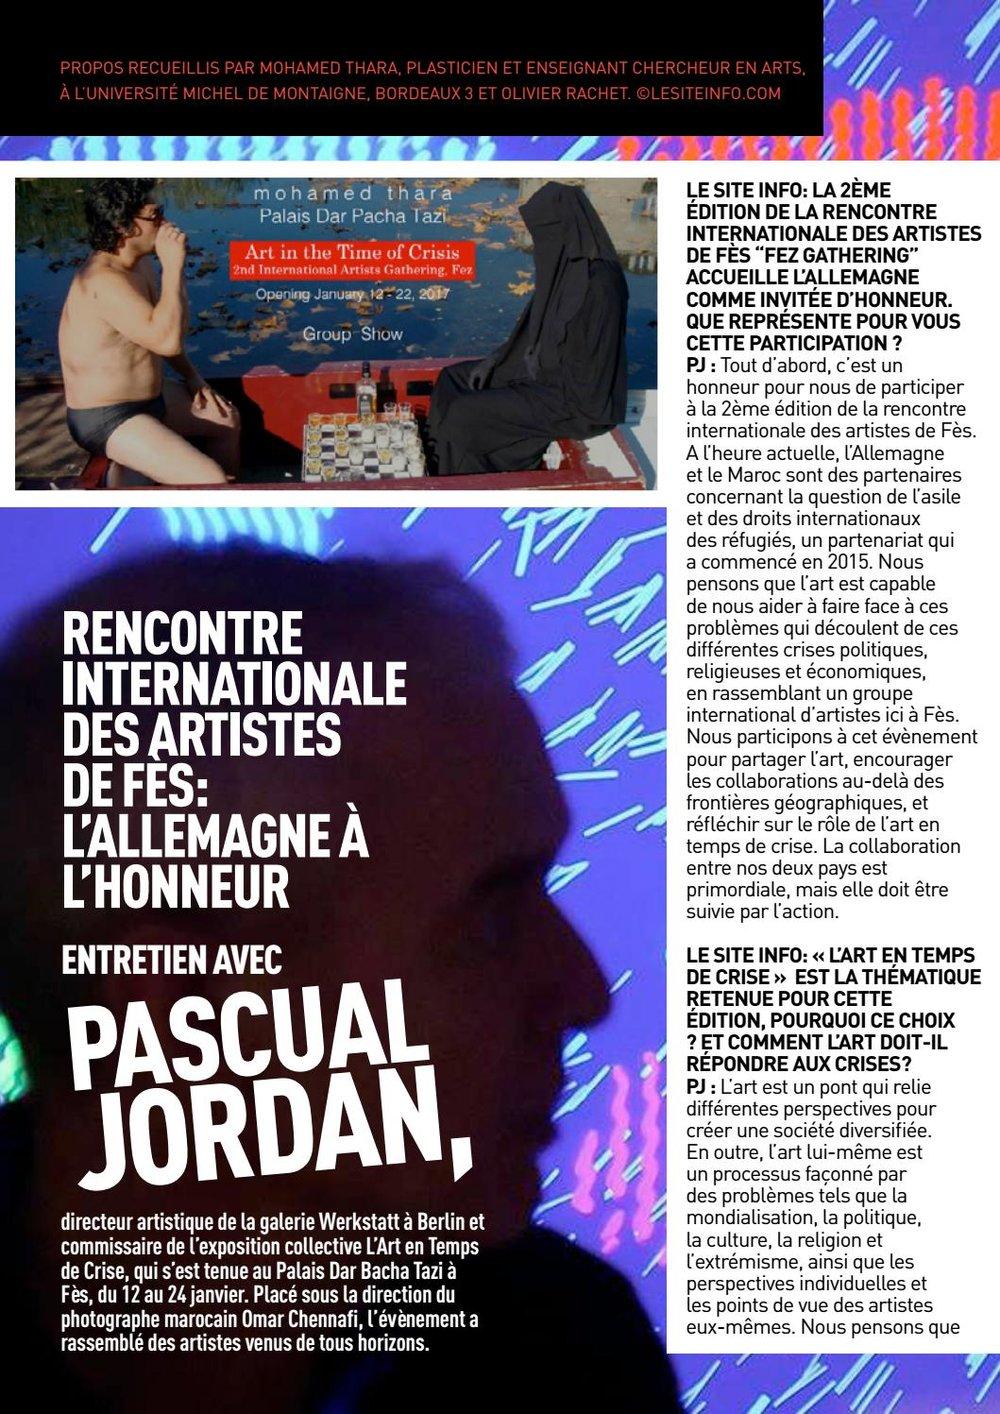 Mohamed Thara L'art en temps de crise Pascual Jordan.jpg